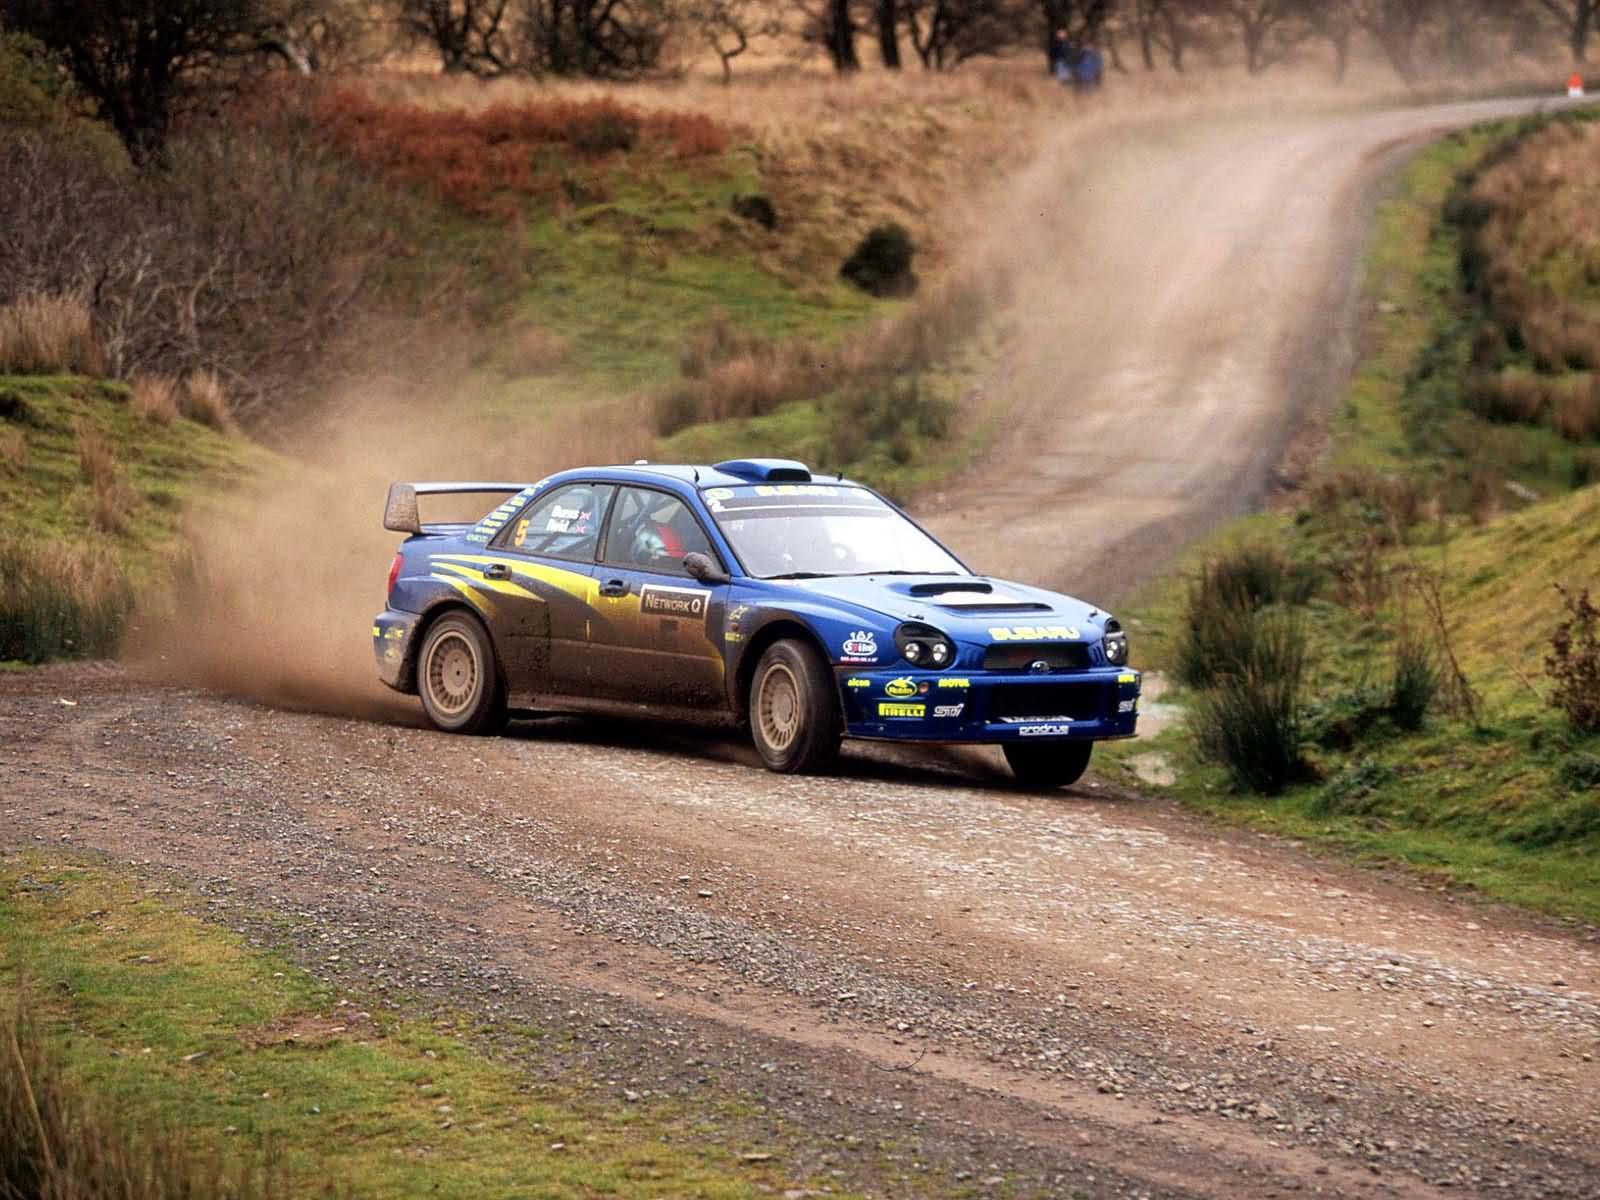 2001_Subaru_Impreza_WRC_322_6958.jpg